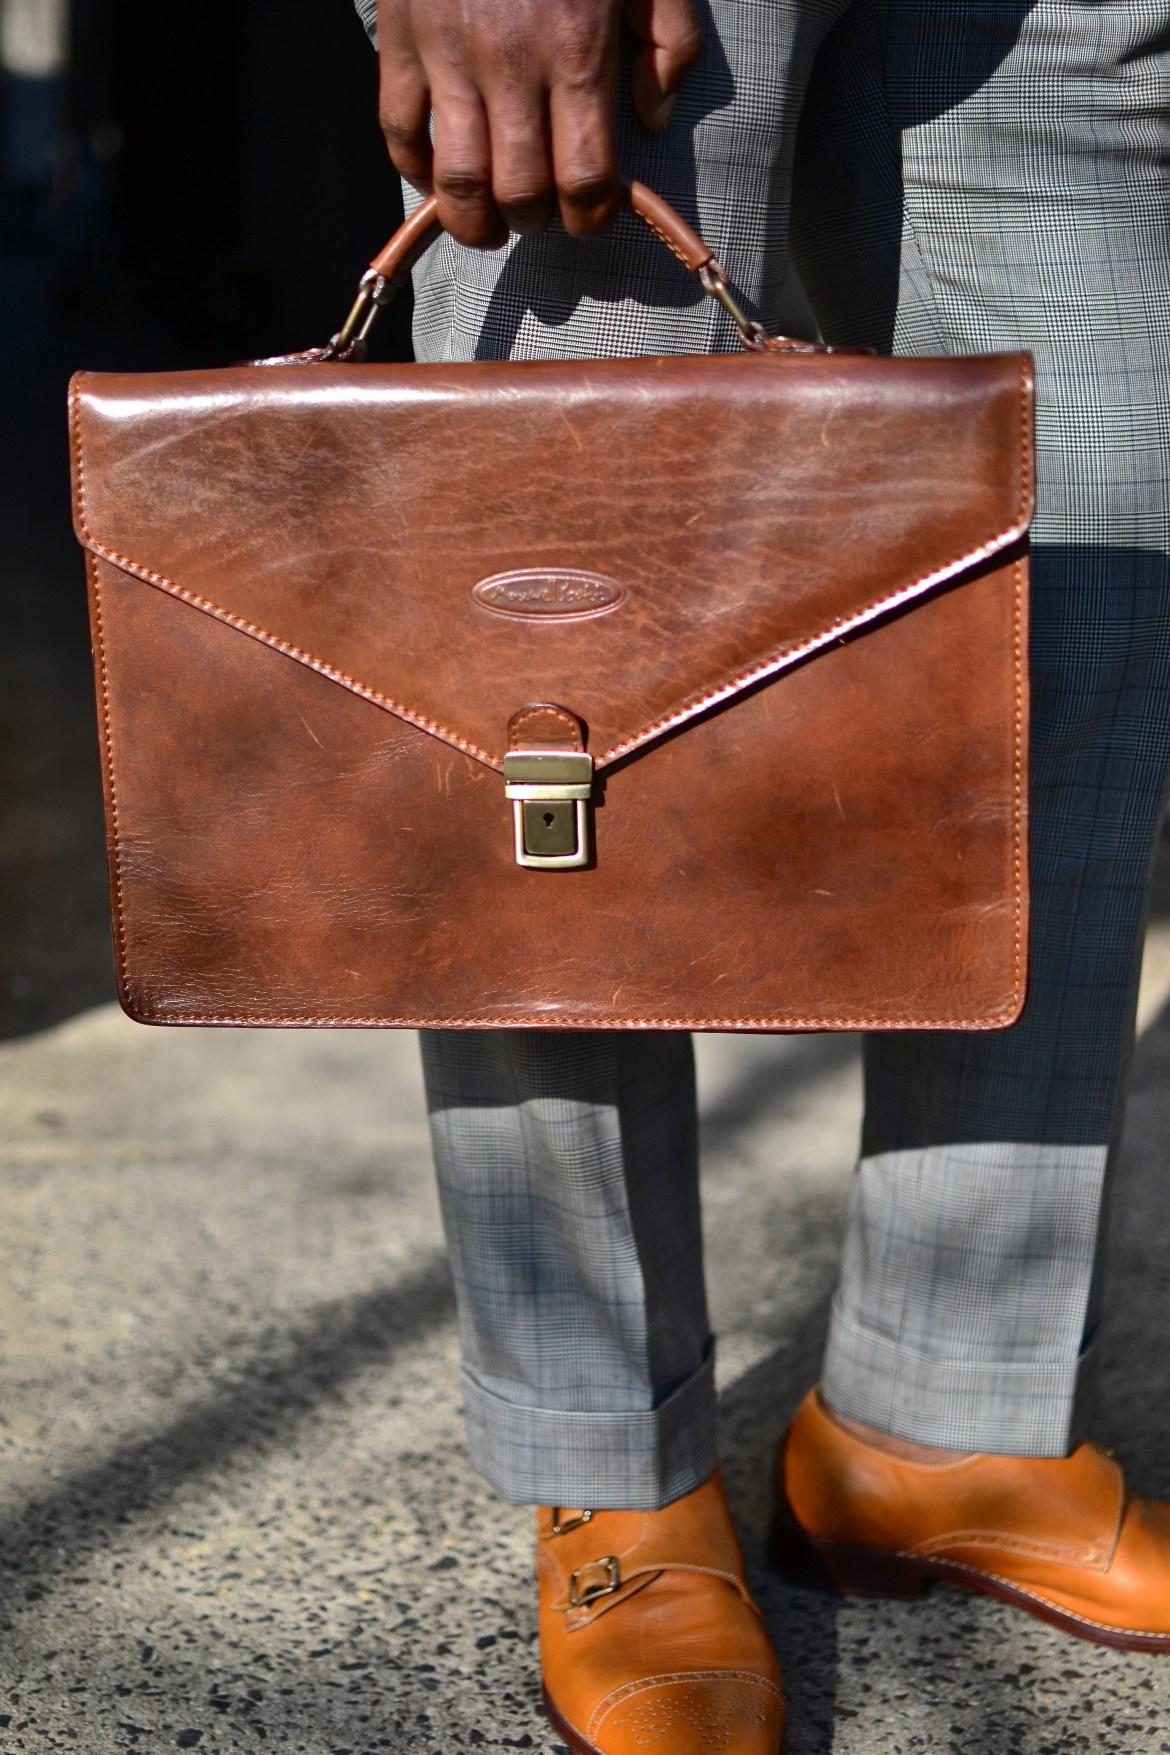 Maxwell Scott Leather Briefcase